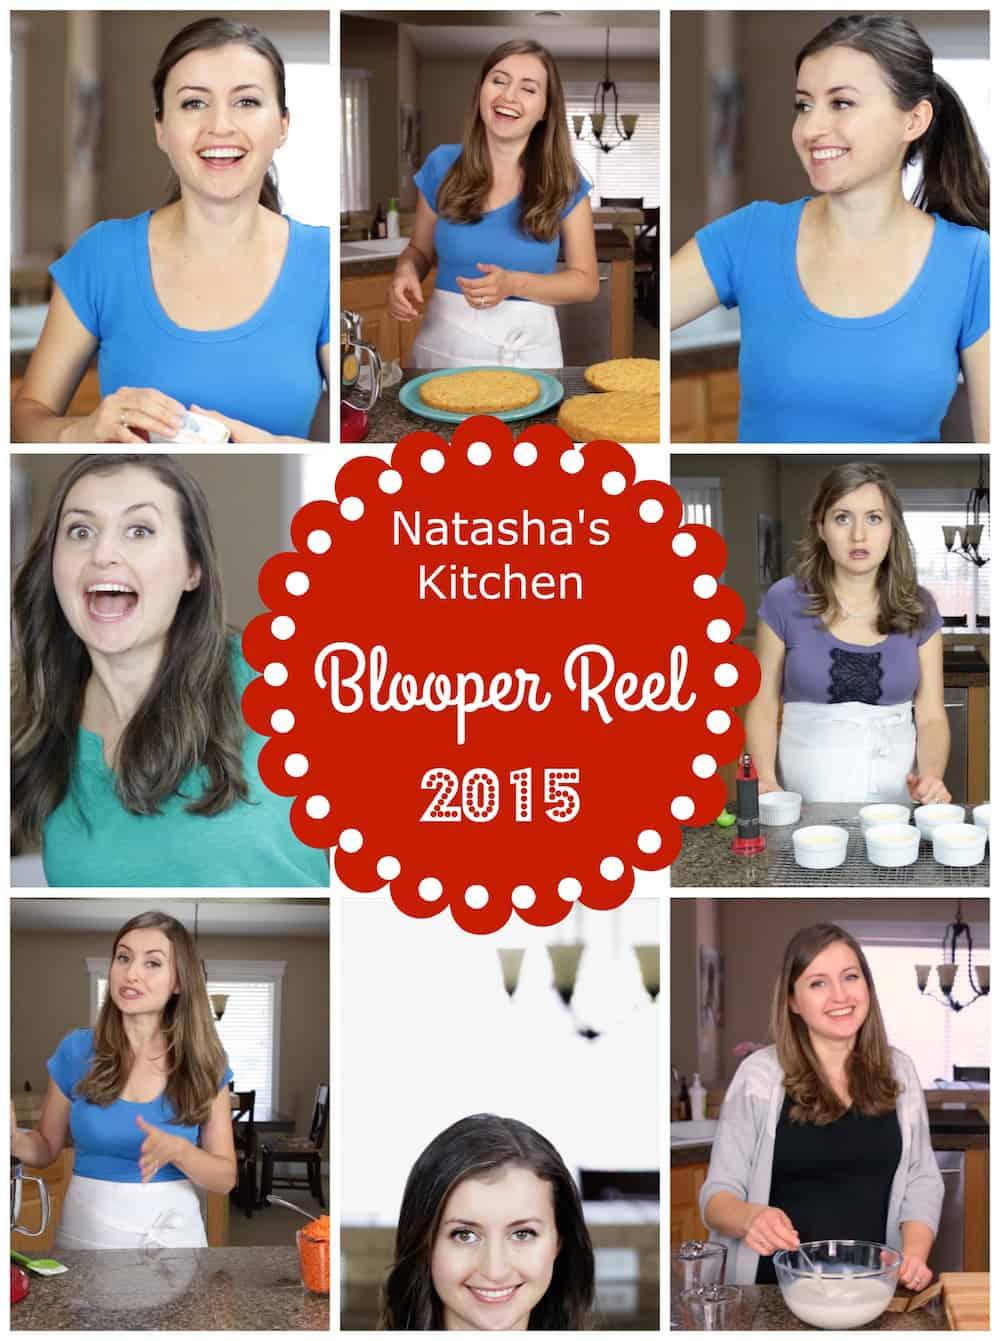 Blooper reel 2015 for Natashas kitchen